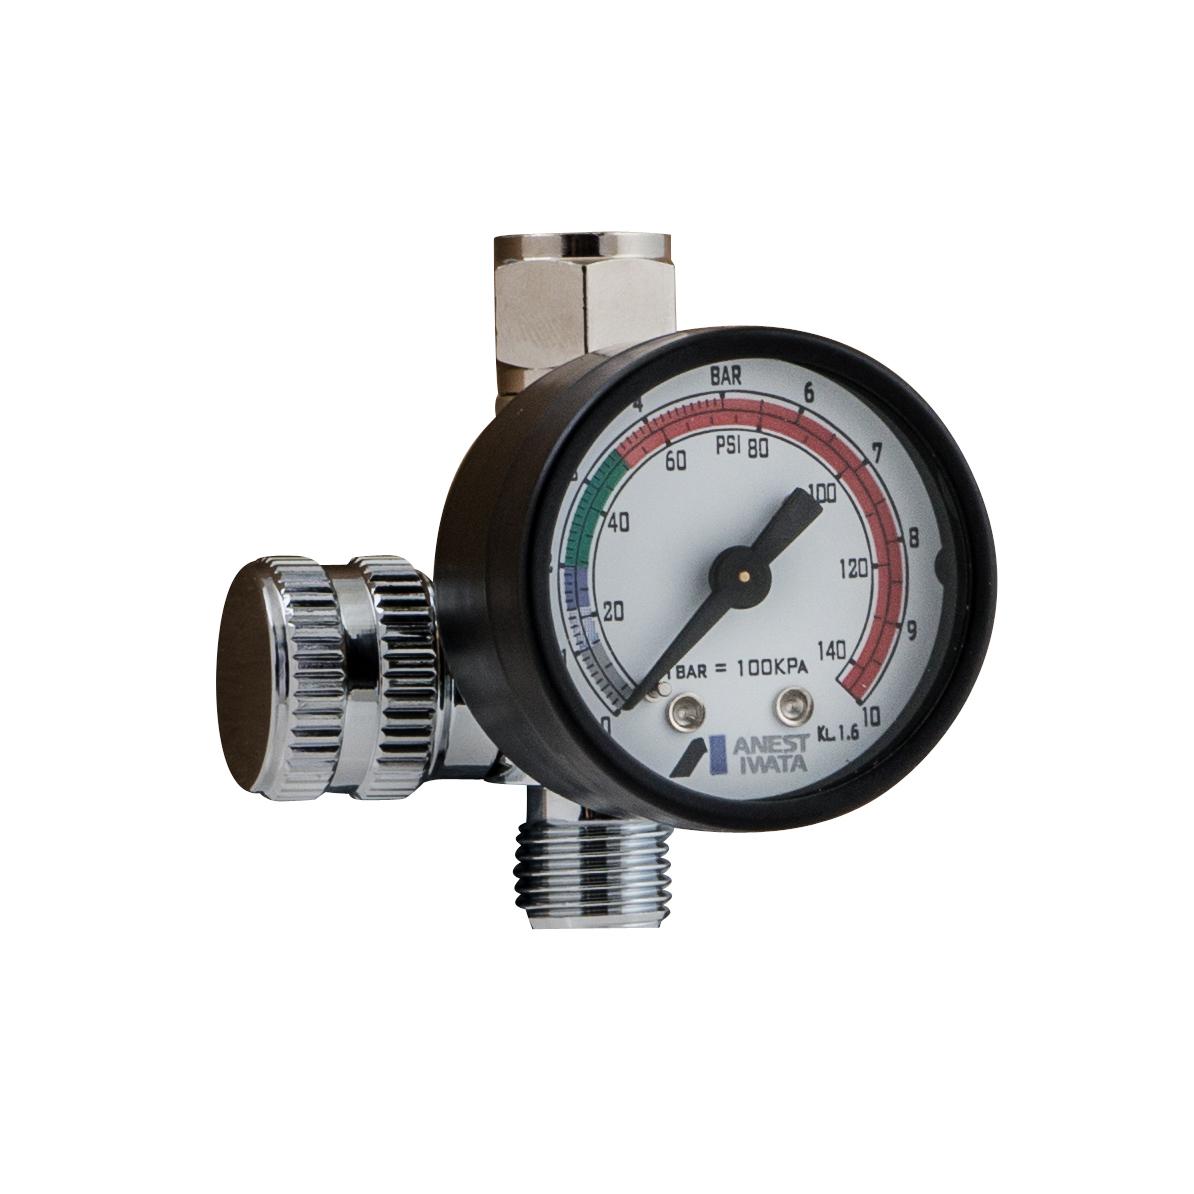 Манометры и регуляторы Регулятор давления c манометром   Impact Controller-2 w2012920700.jpg